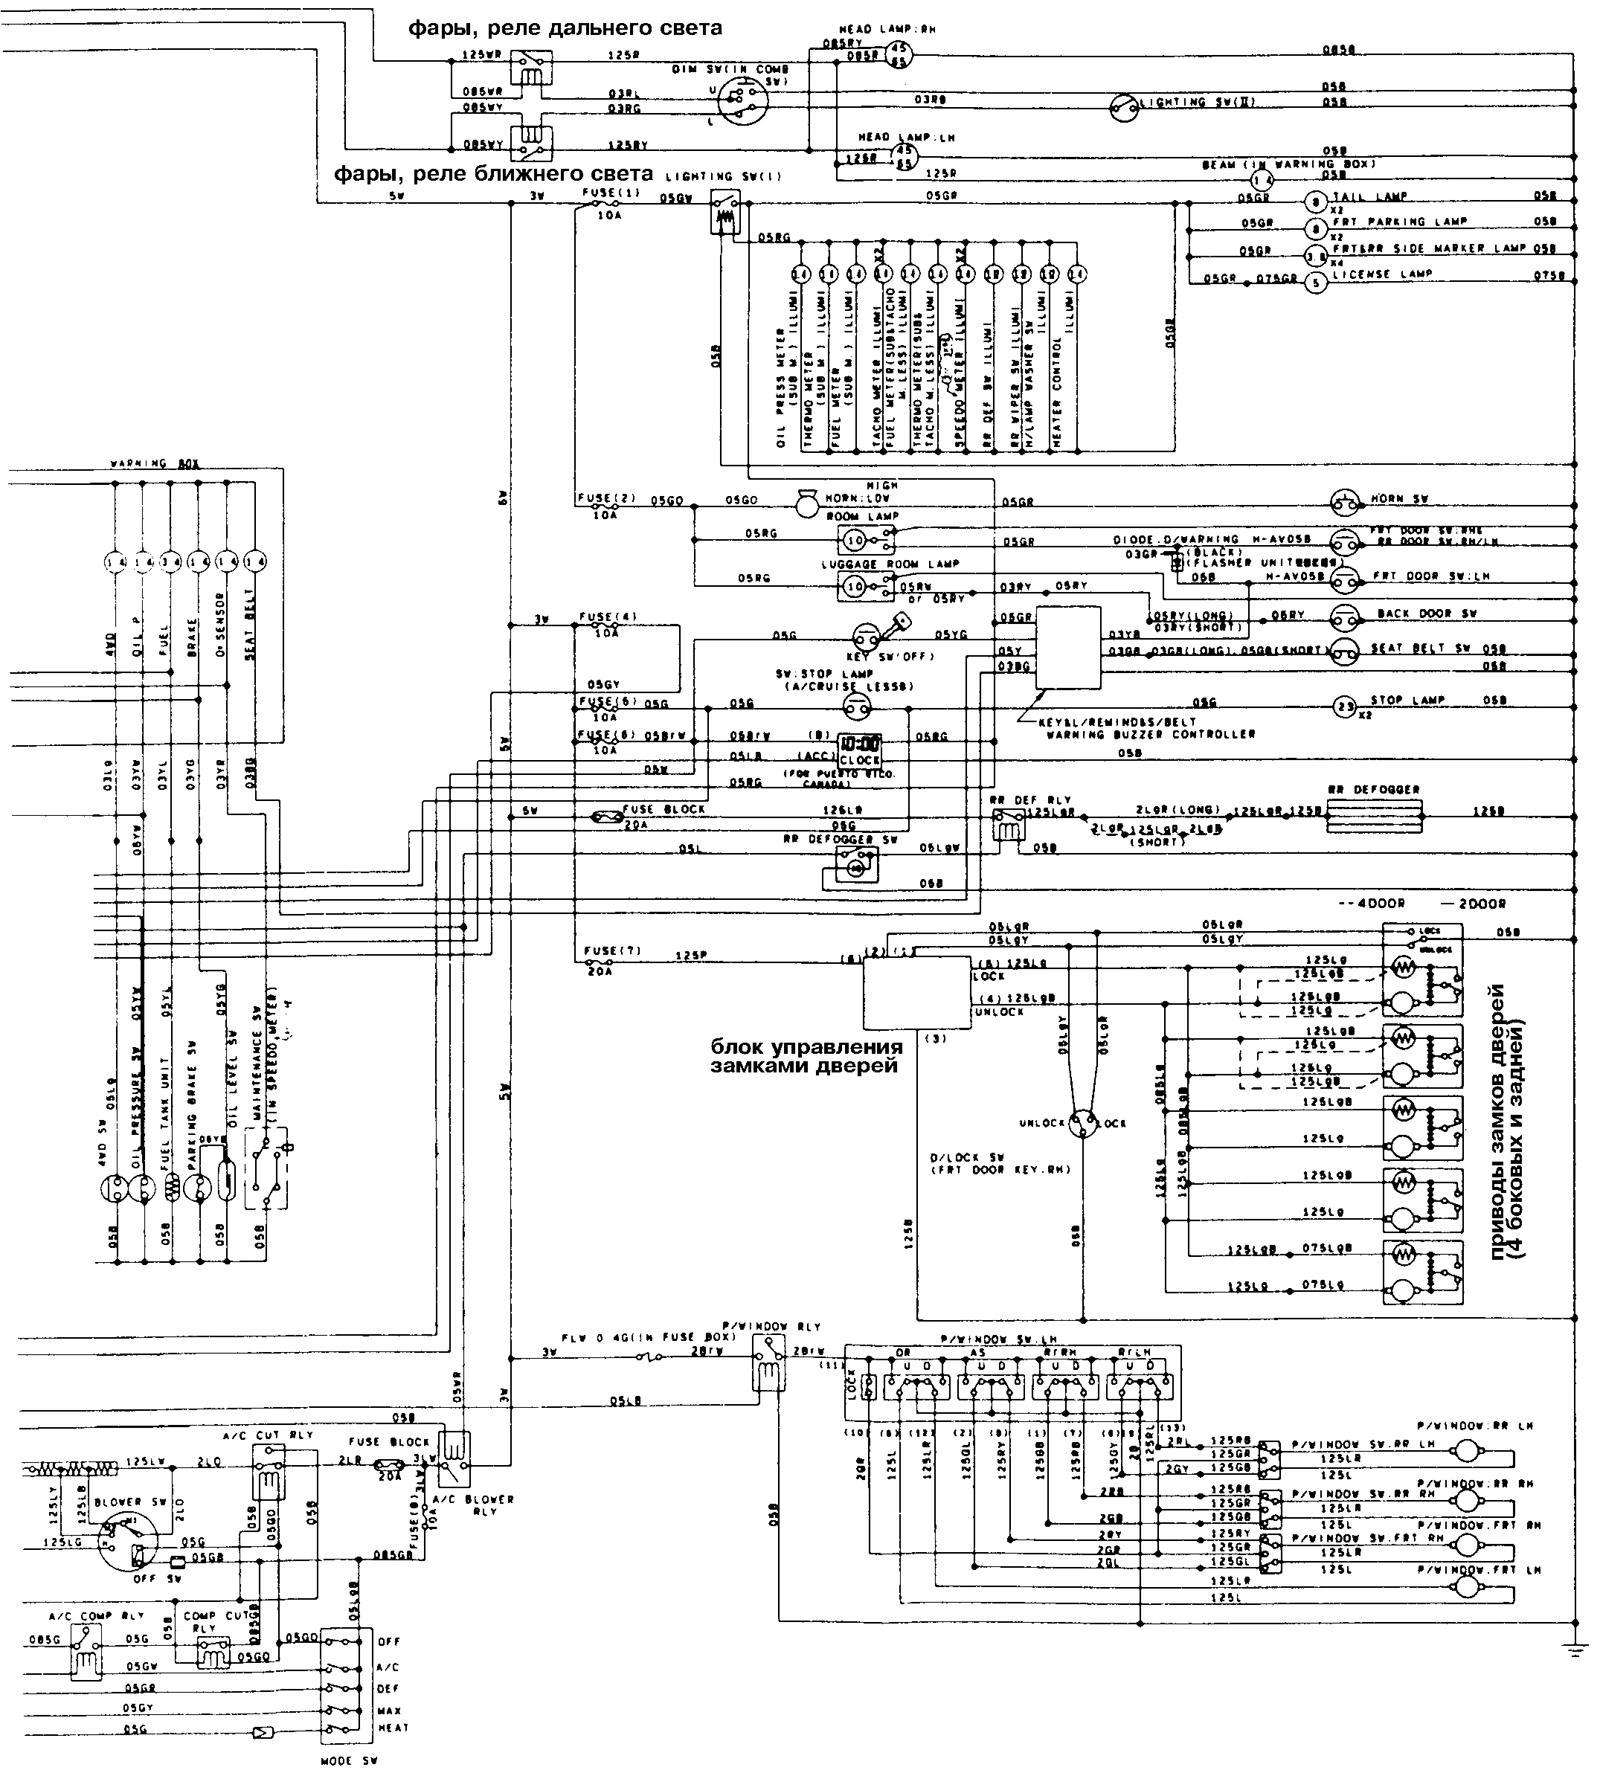 88 Isuzu Pickup Wiring Diagram 5610 Ford Tractor Wiring Diagram Begeboy Wiring Diagram Source